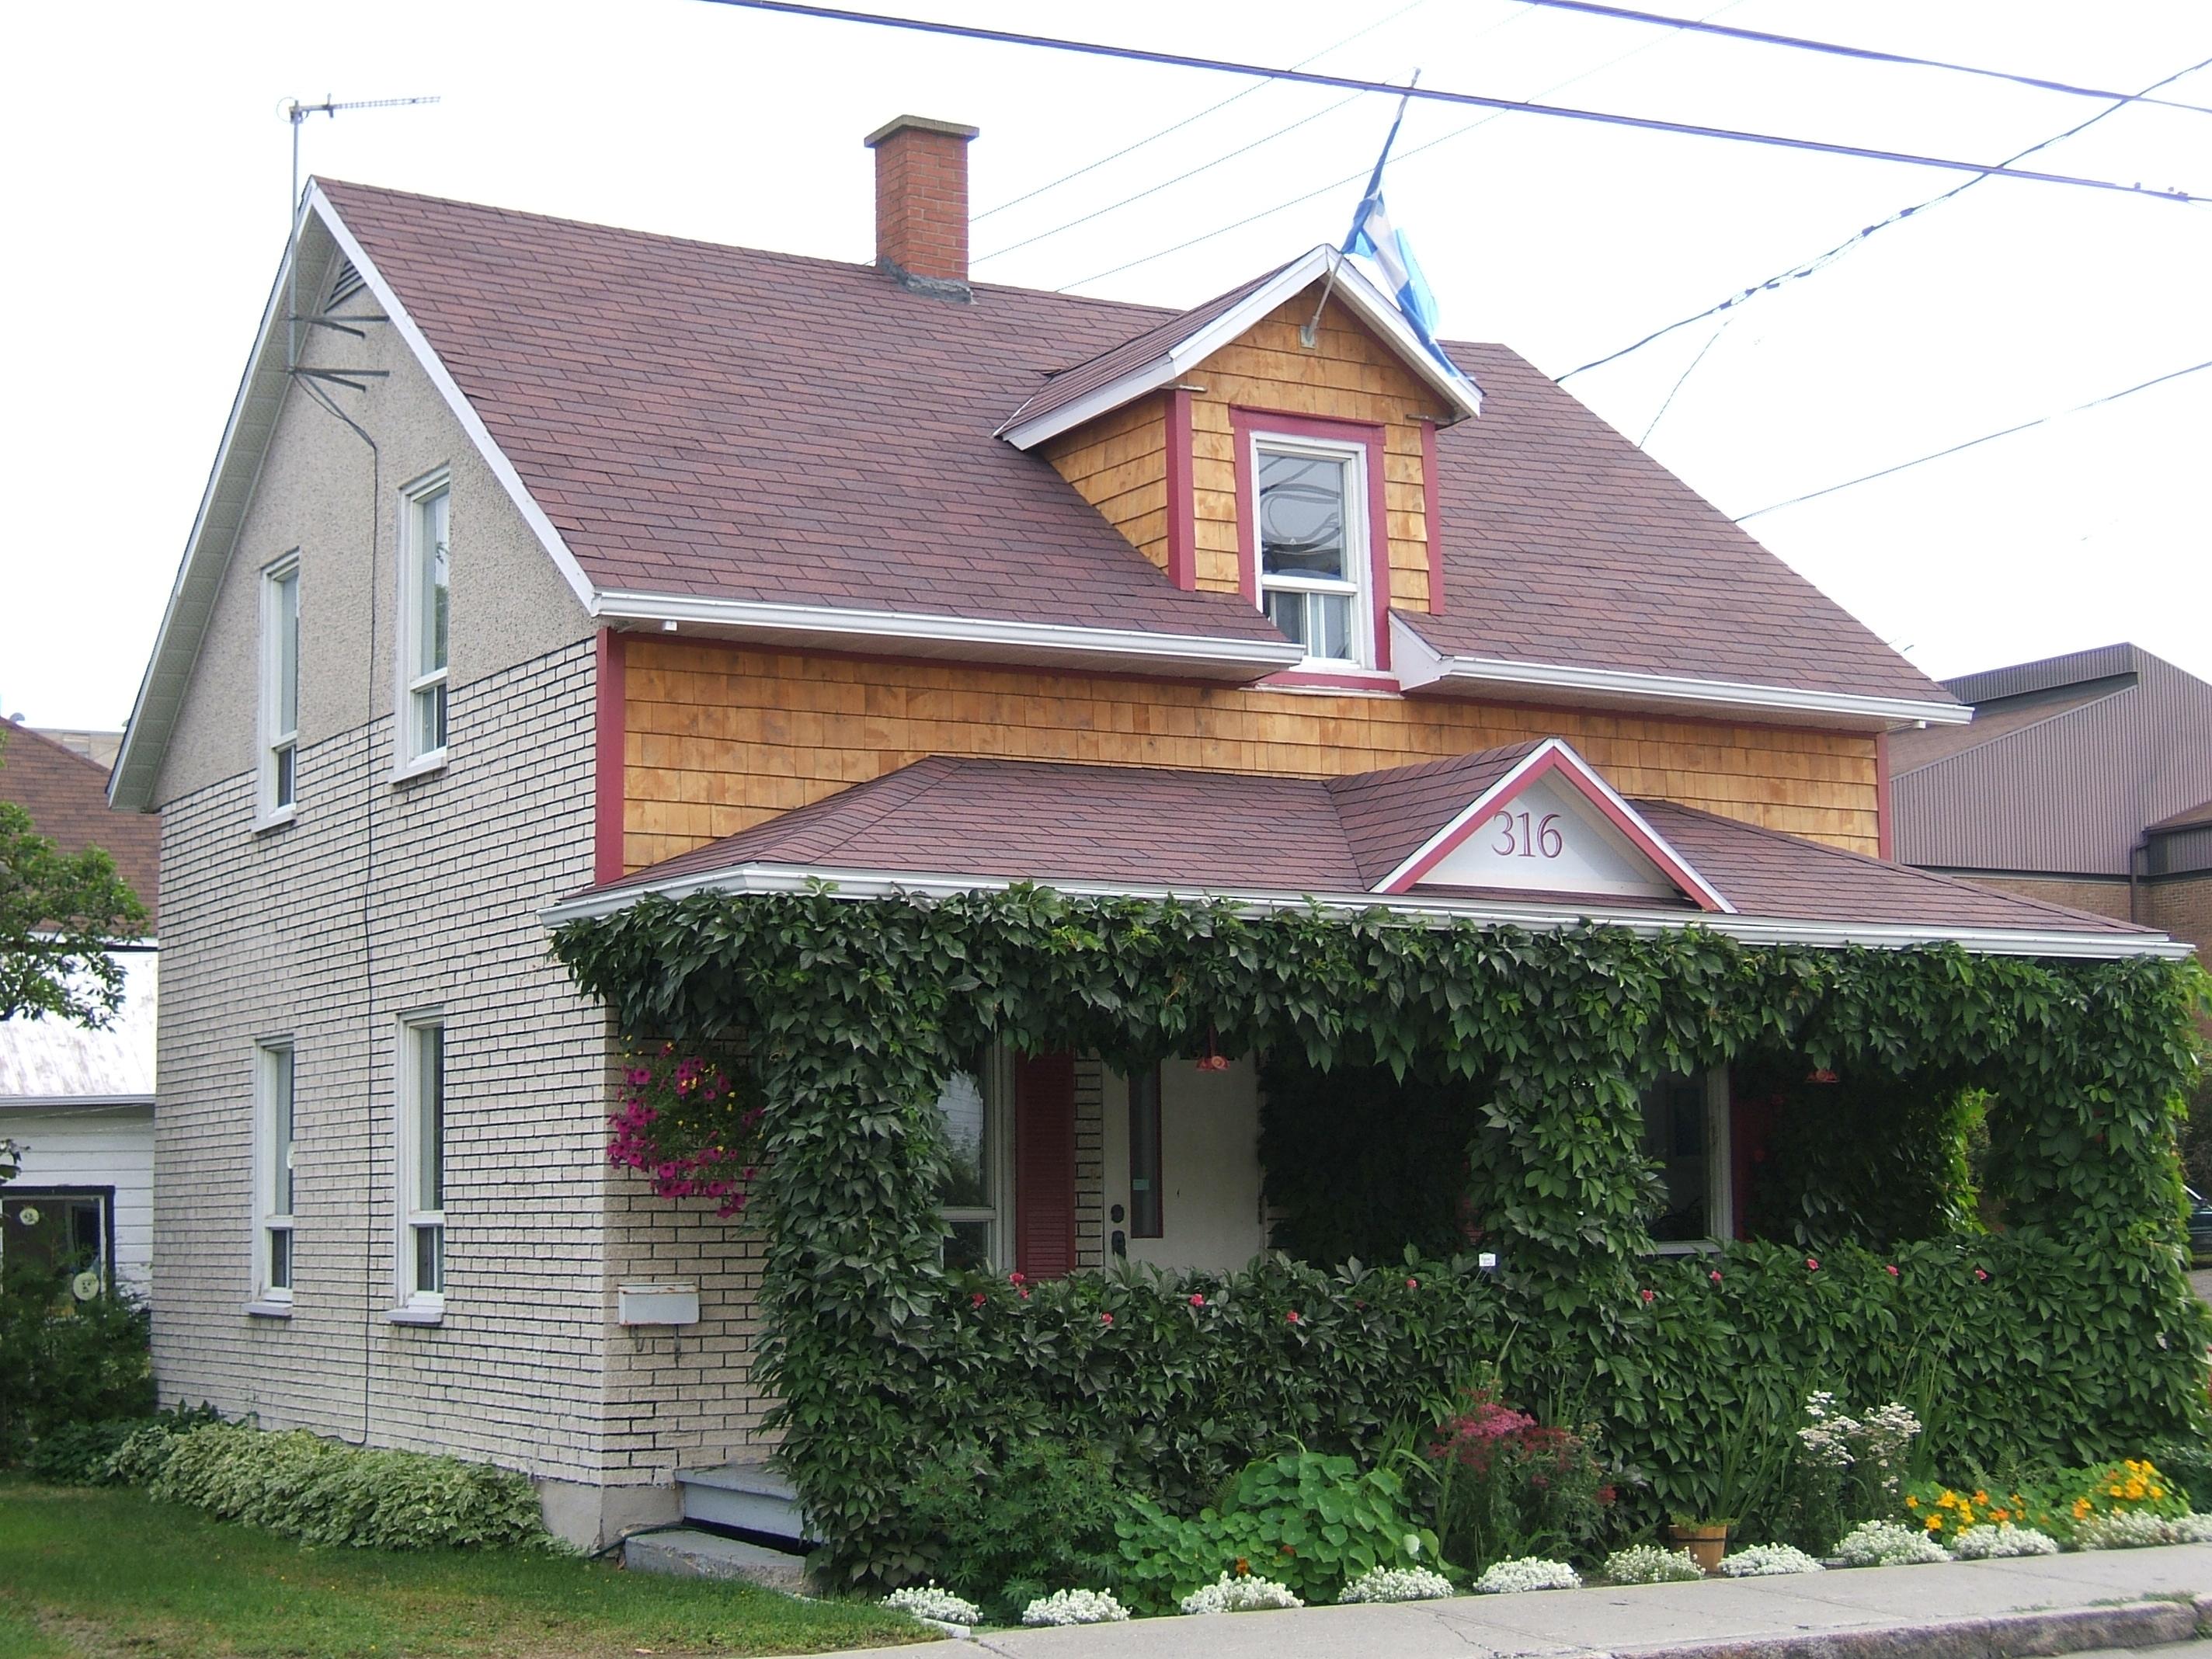 1197 - 316, avenue Rouleau